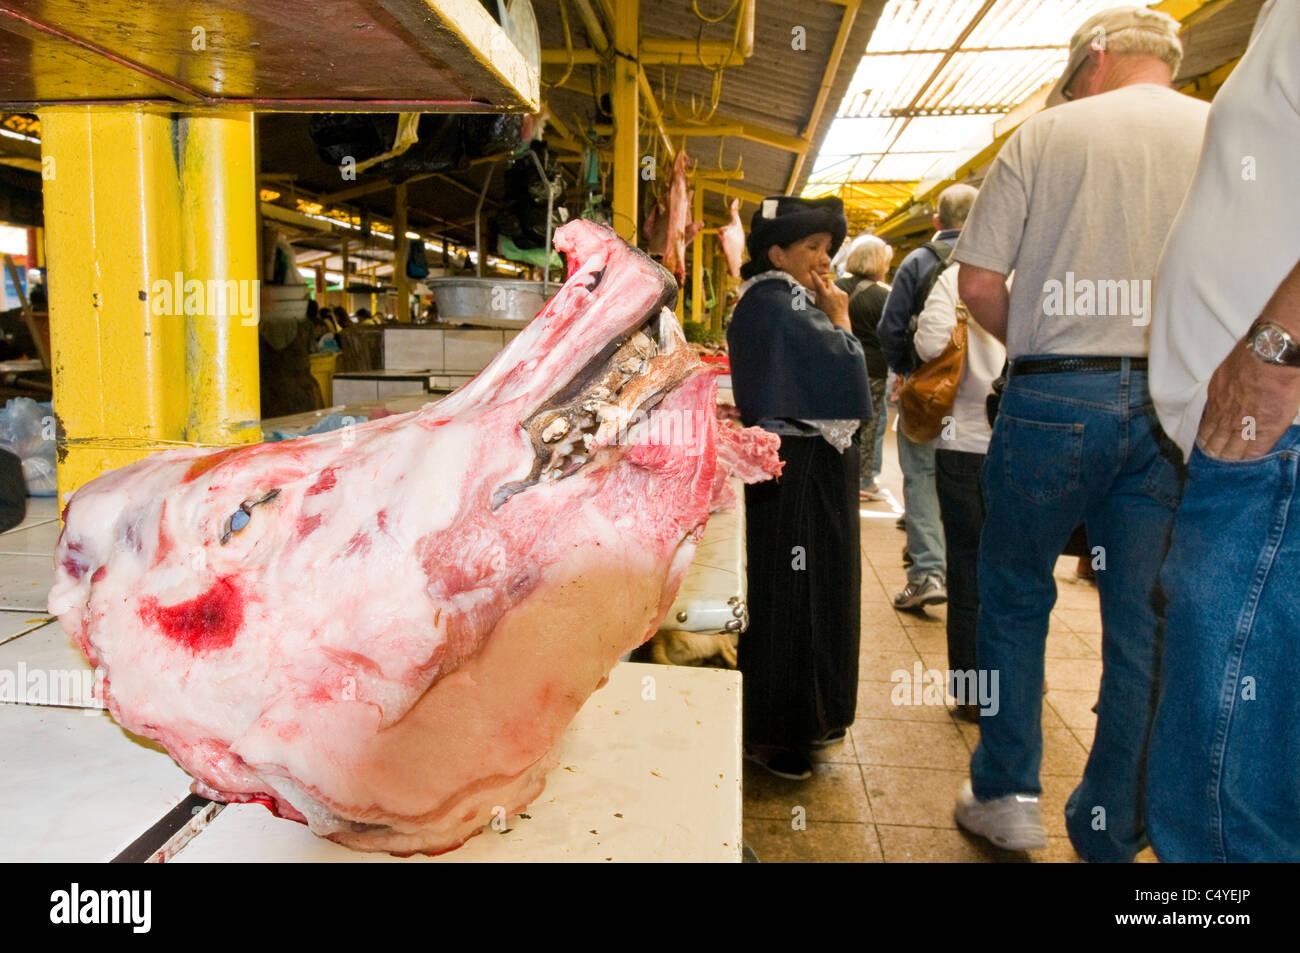 Skinned boar's head in open-air market in Otavalo Ecuador - Stock Image